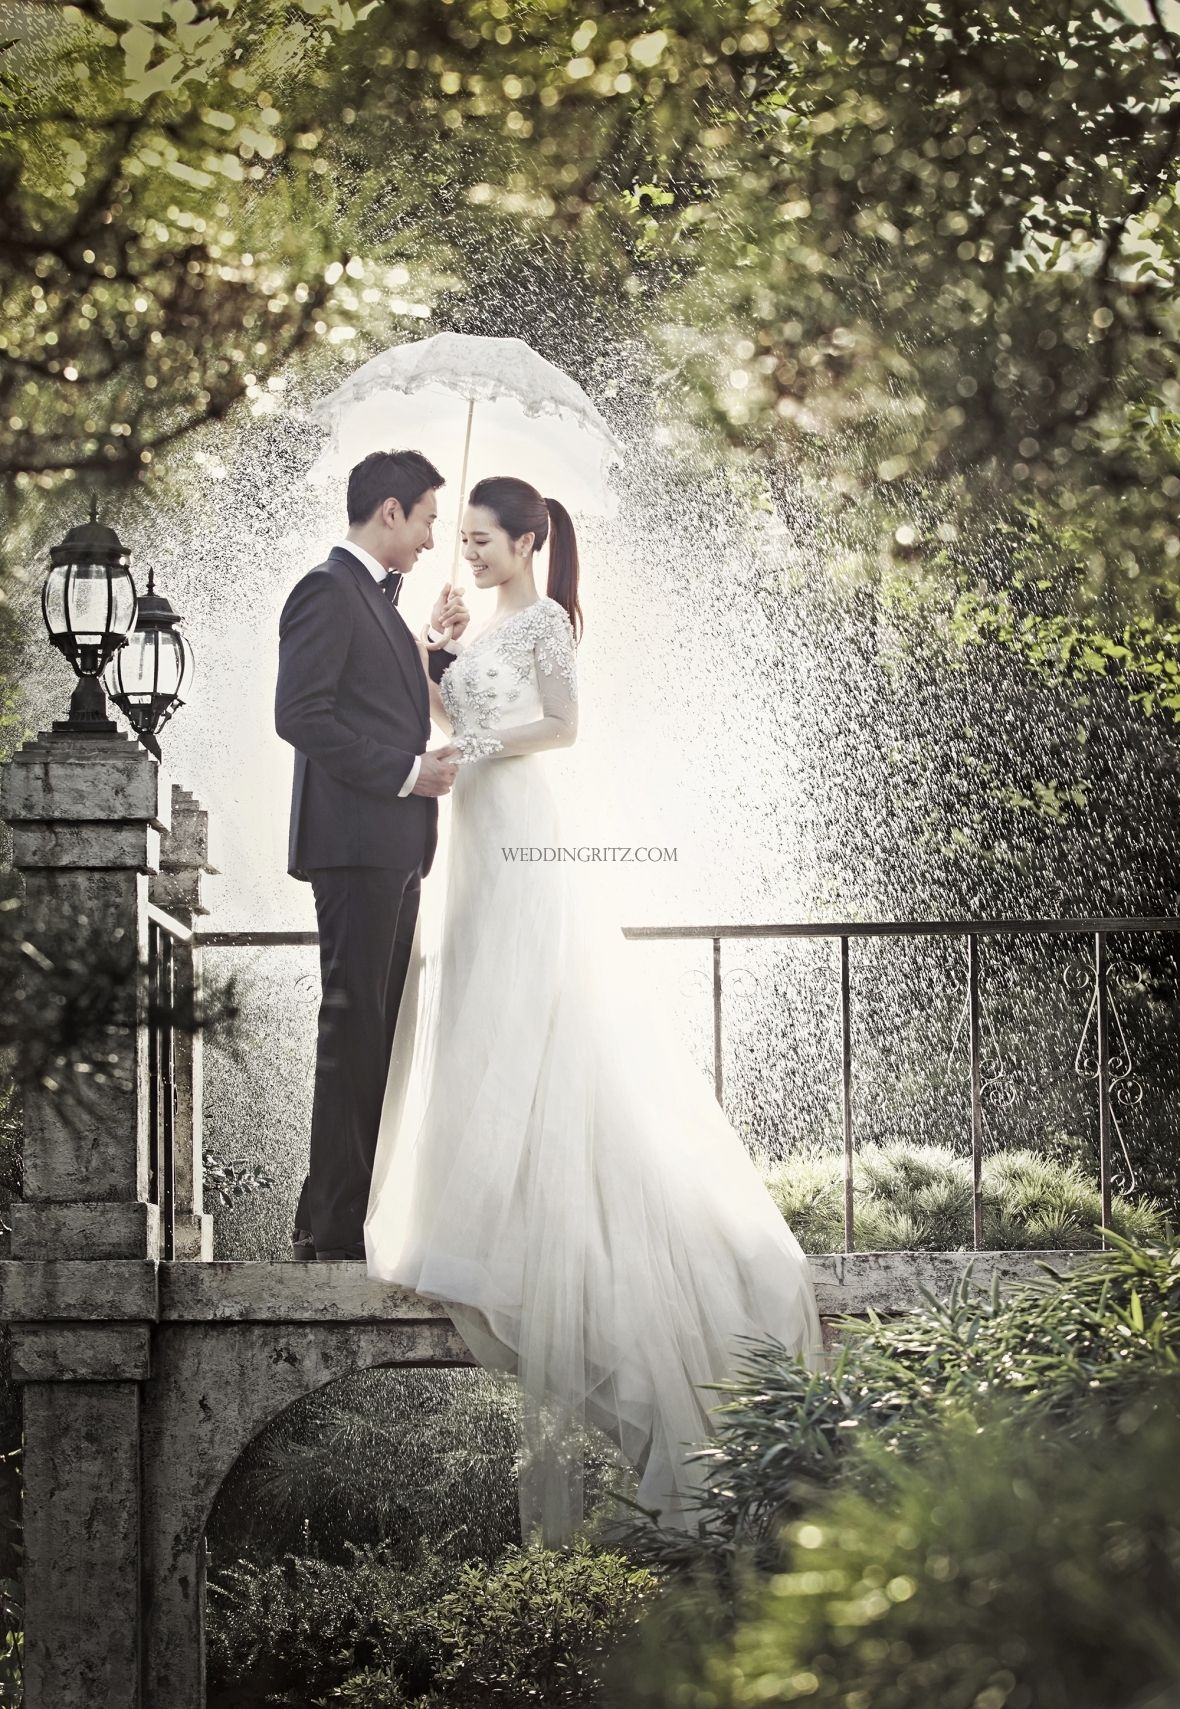 Korea pre wedding Courtesy to dingritz  Prewedding